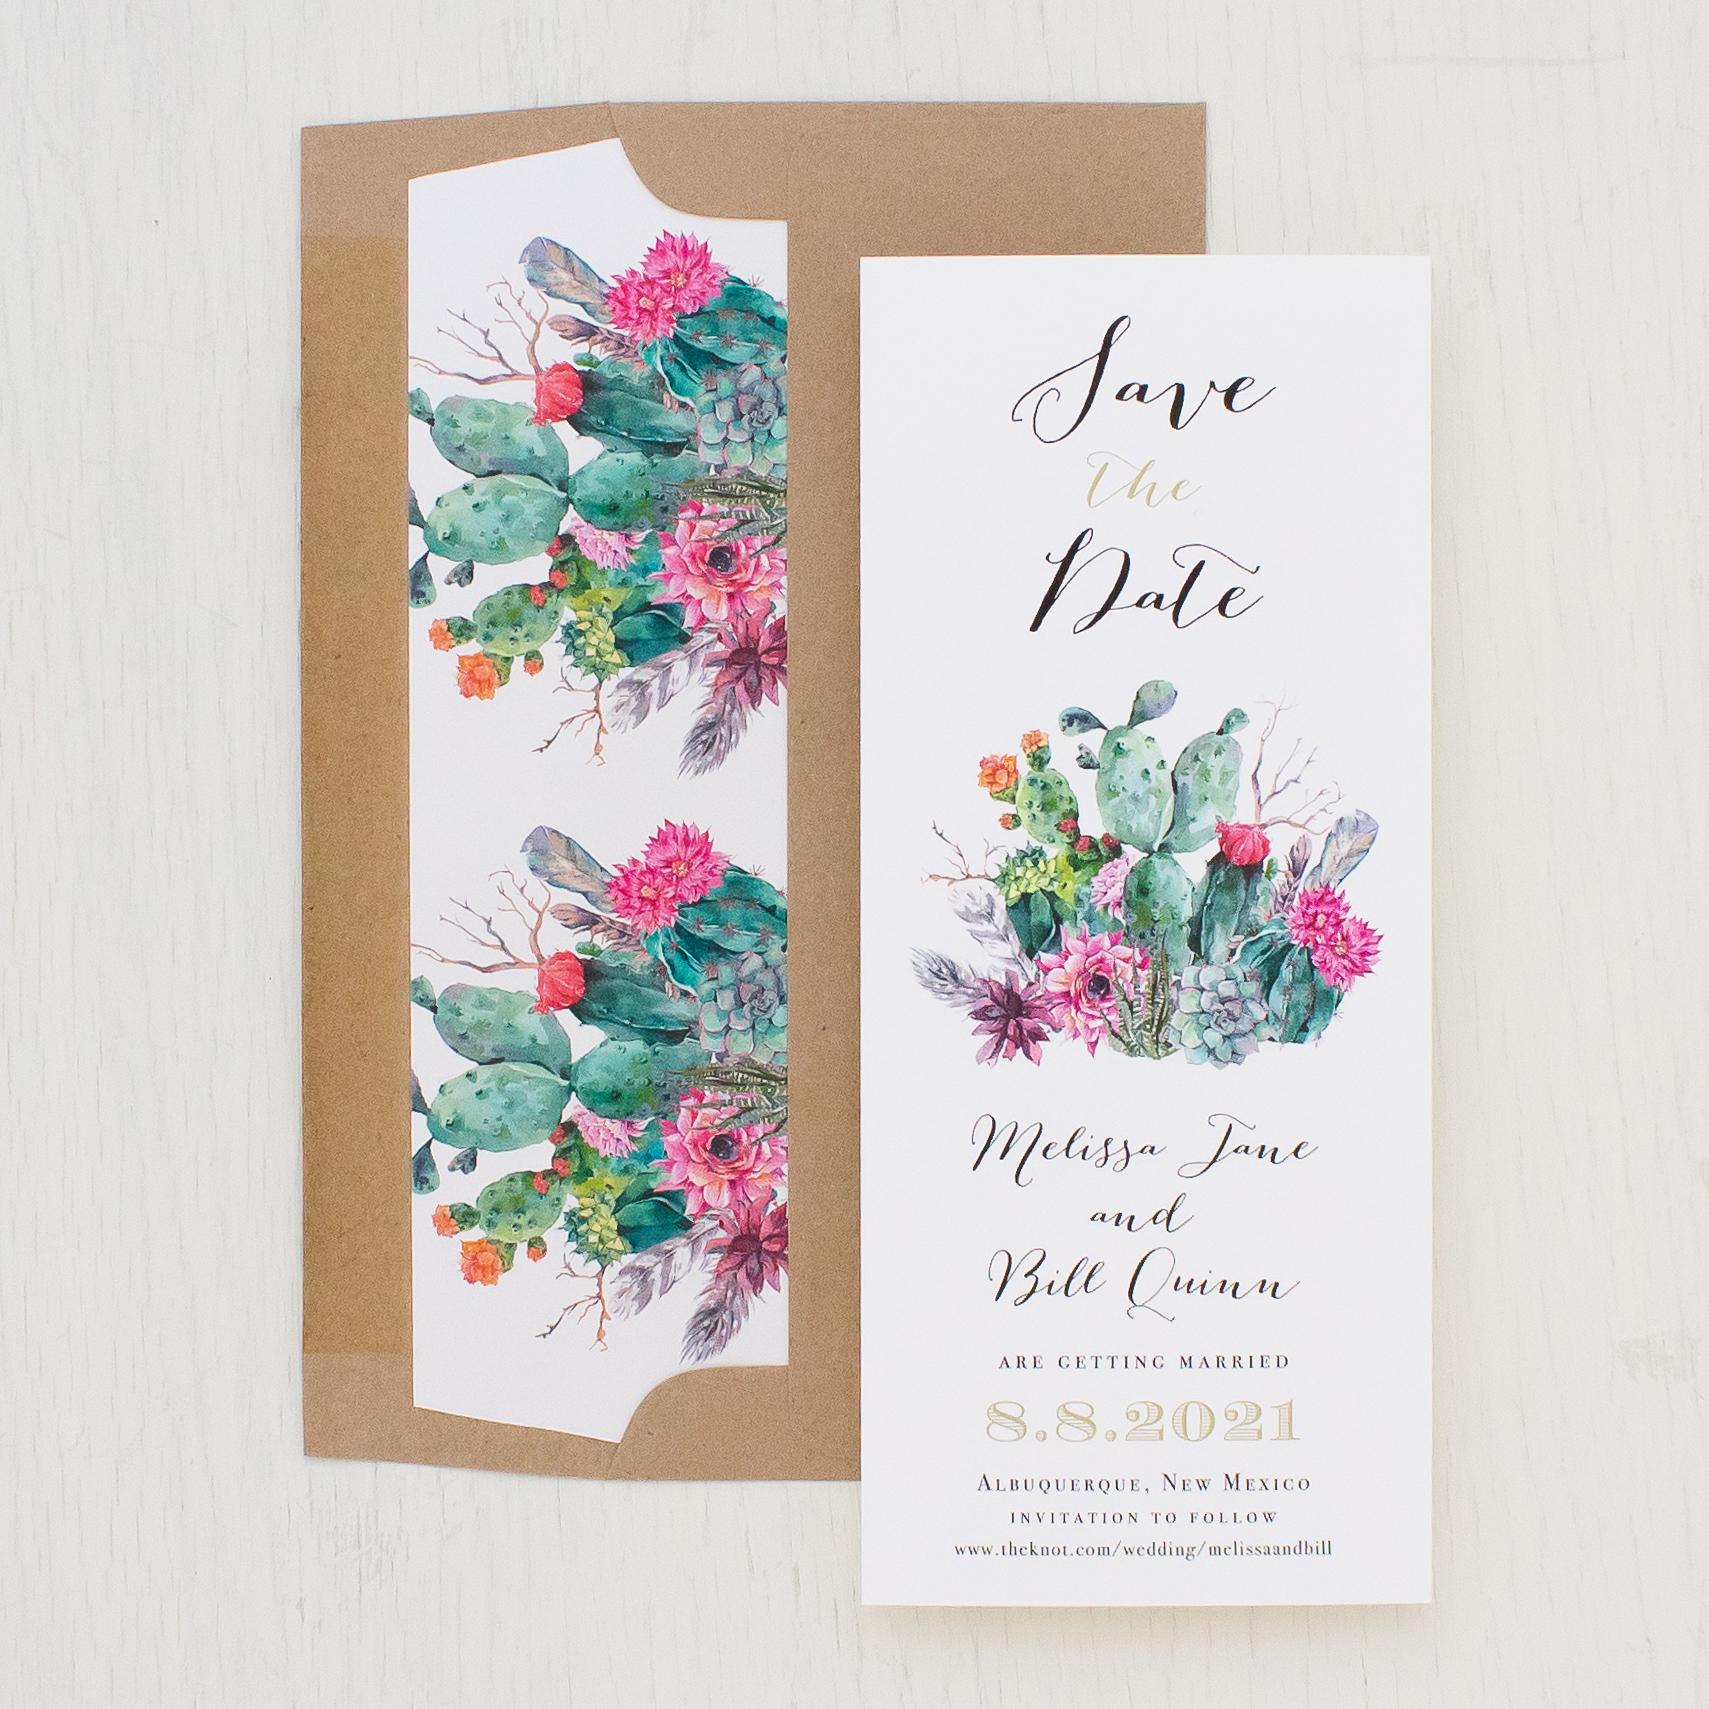 Desert Blooms Save The Dates | Beacon Lane Invitations